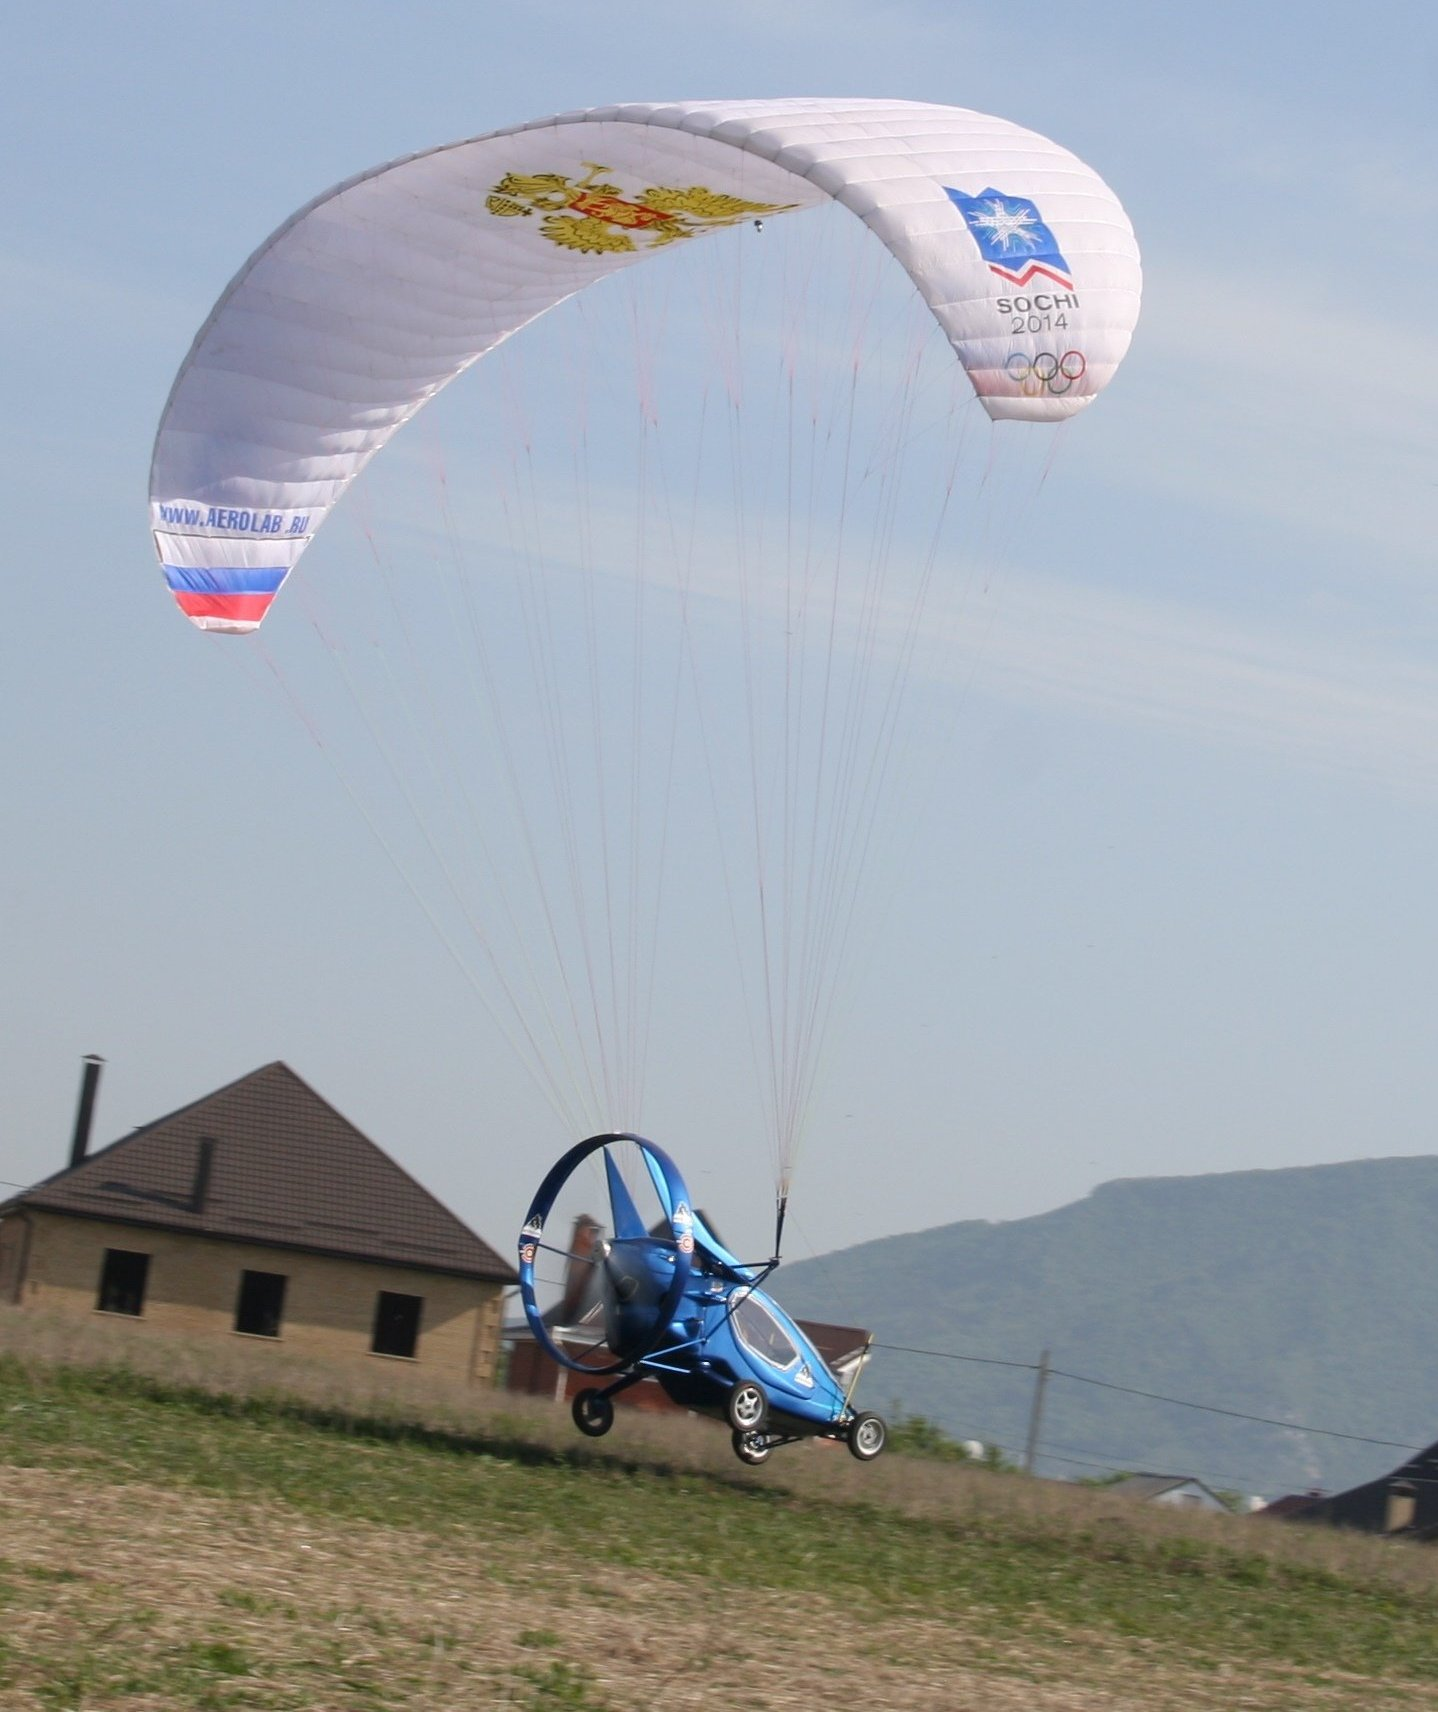 Un begalet, una aeronave híbrida ultraligera rusa